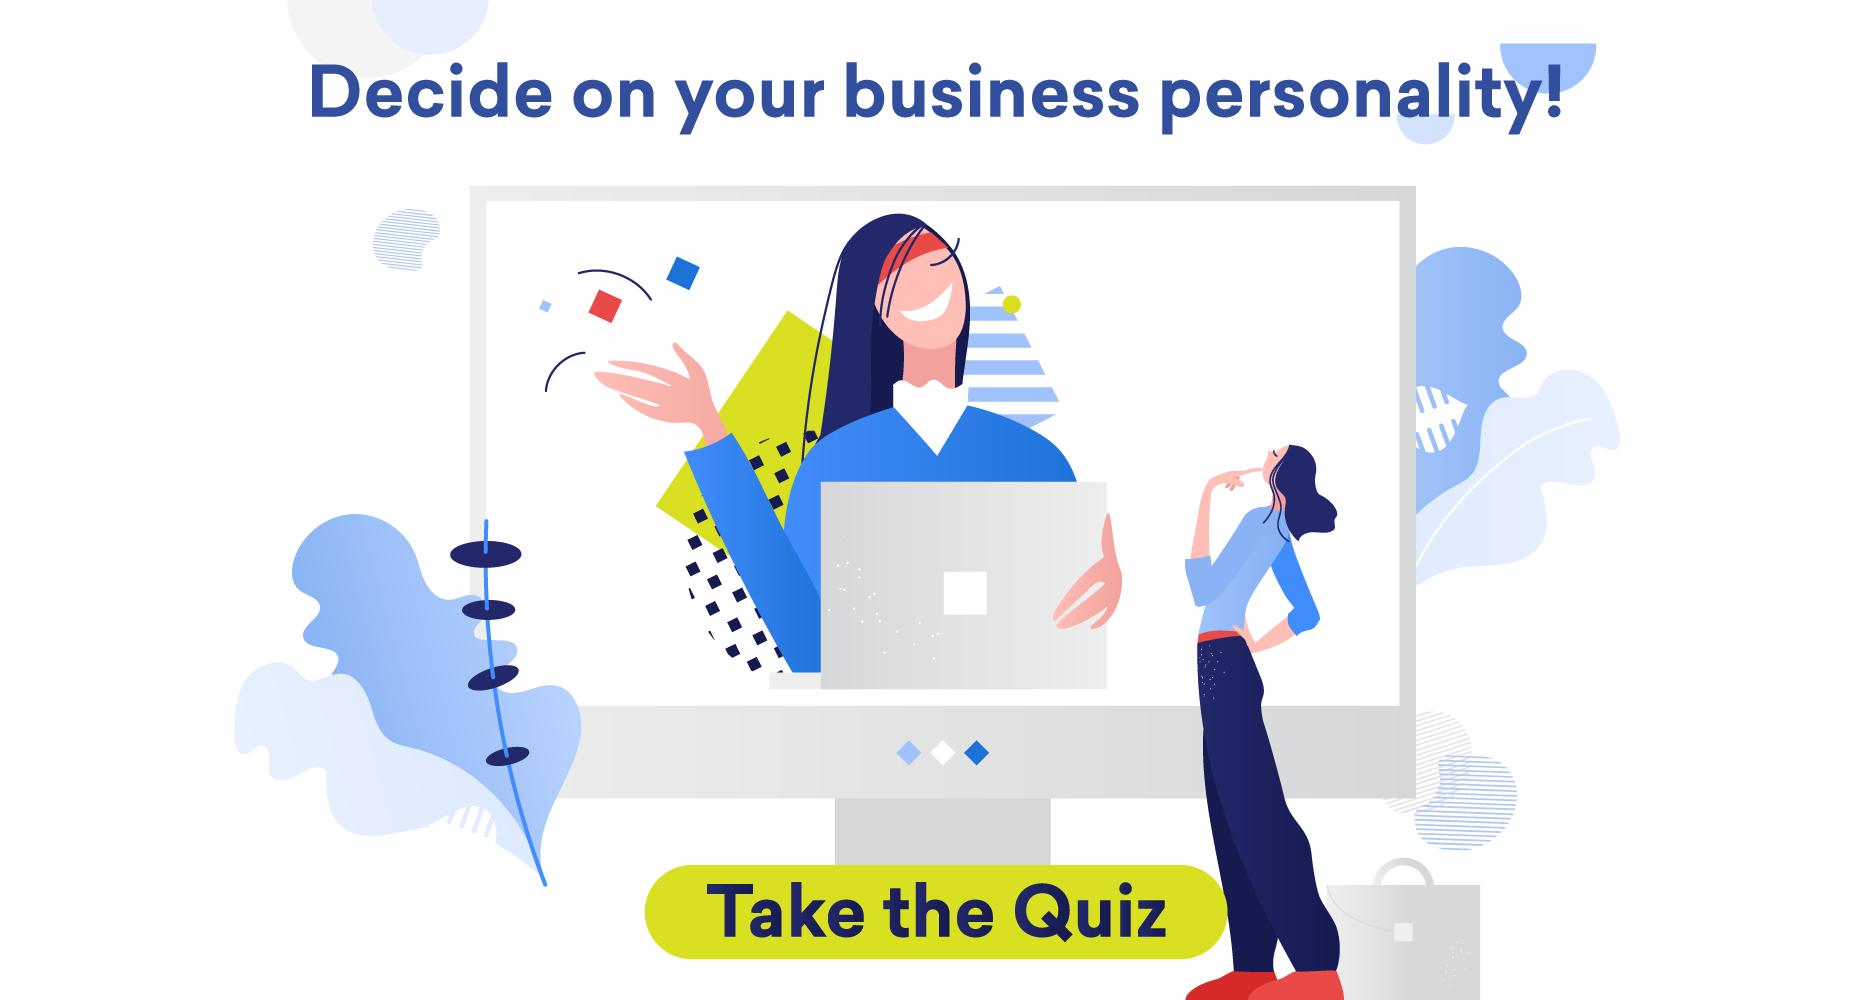 https://presentation.decktopus.com/business-personality-quiz